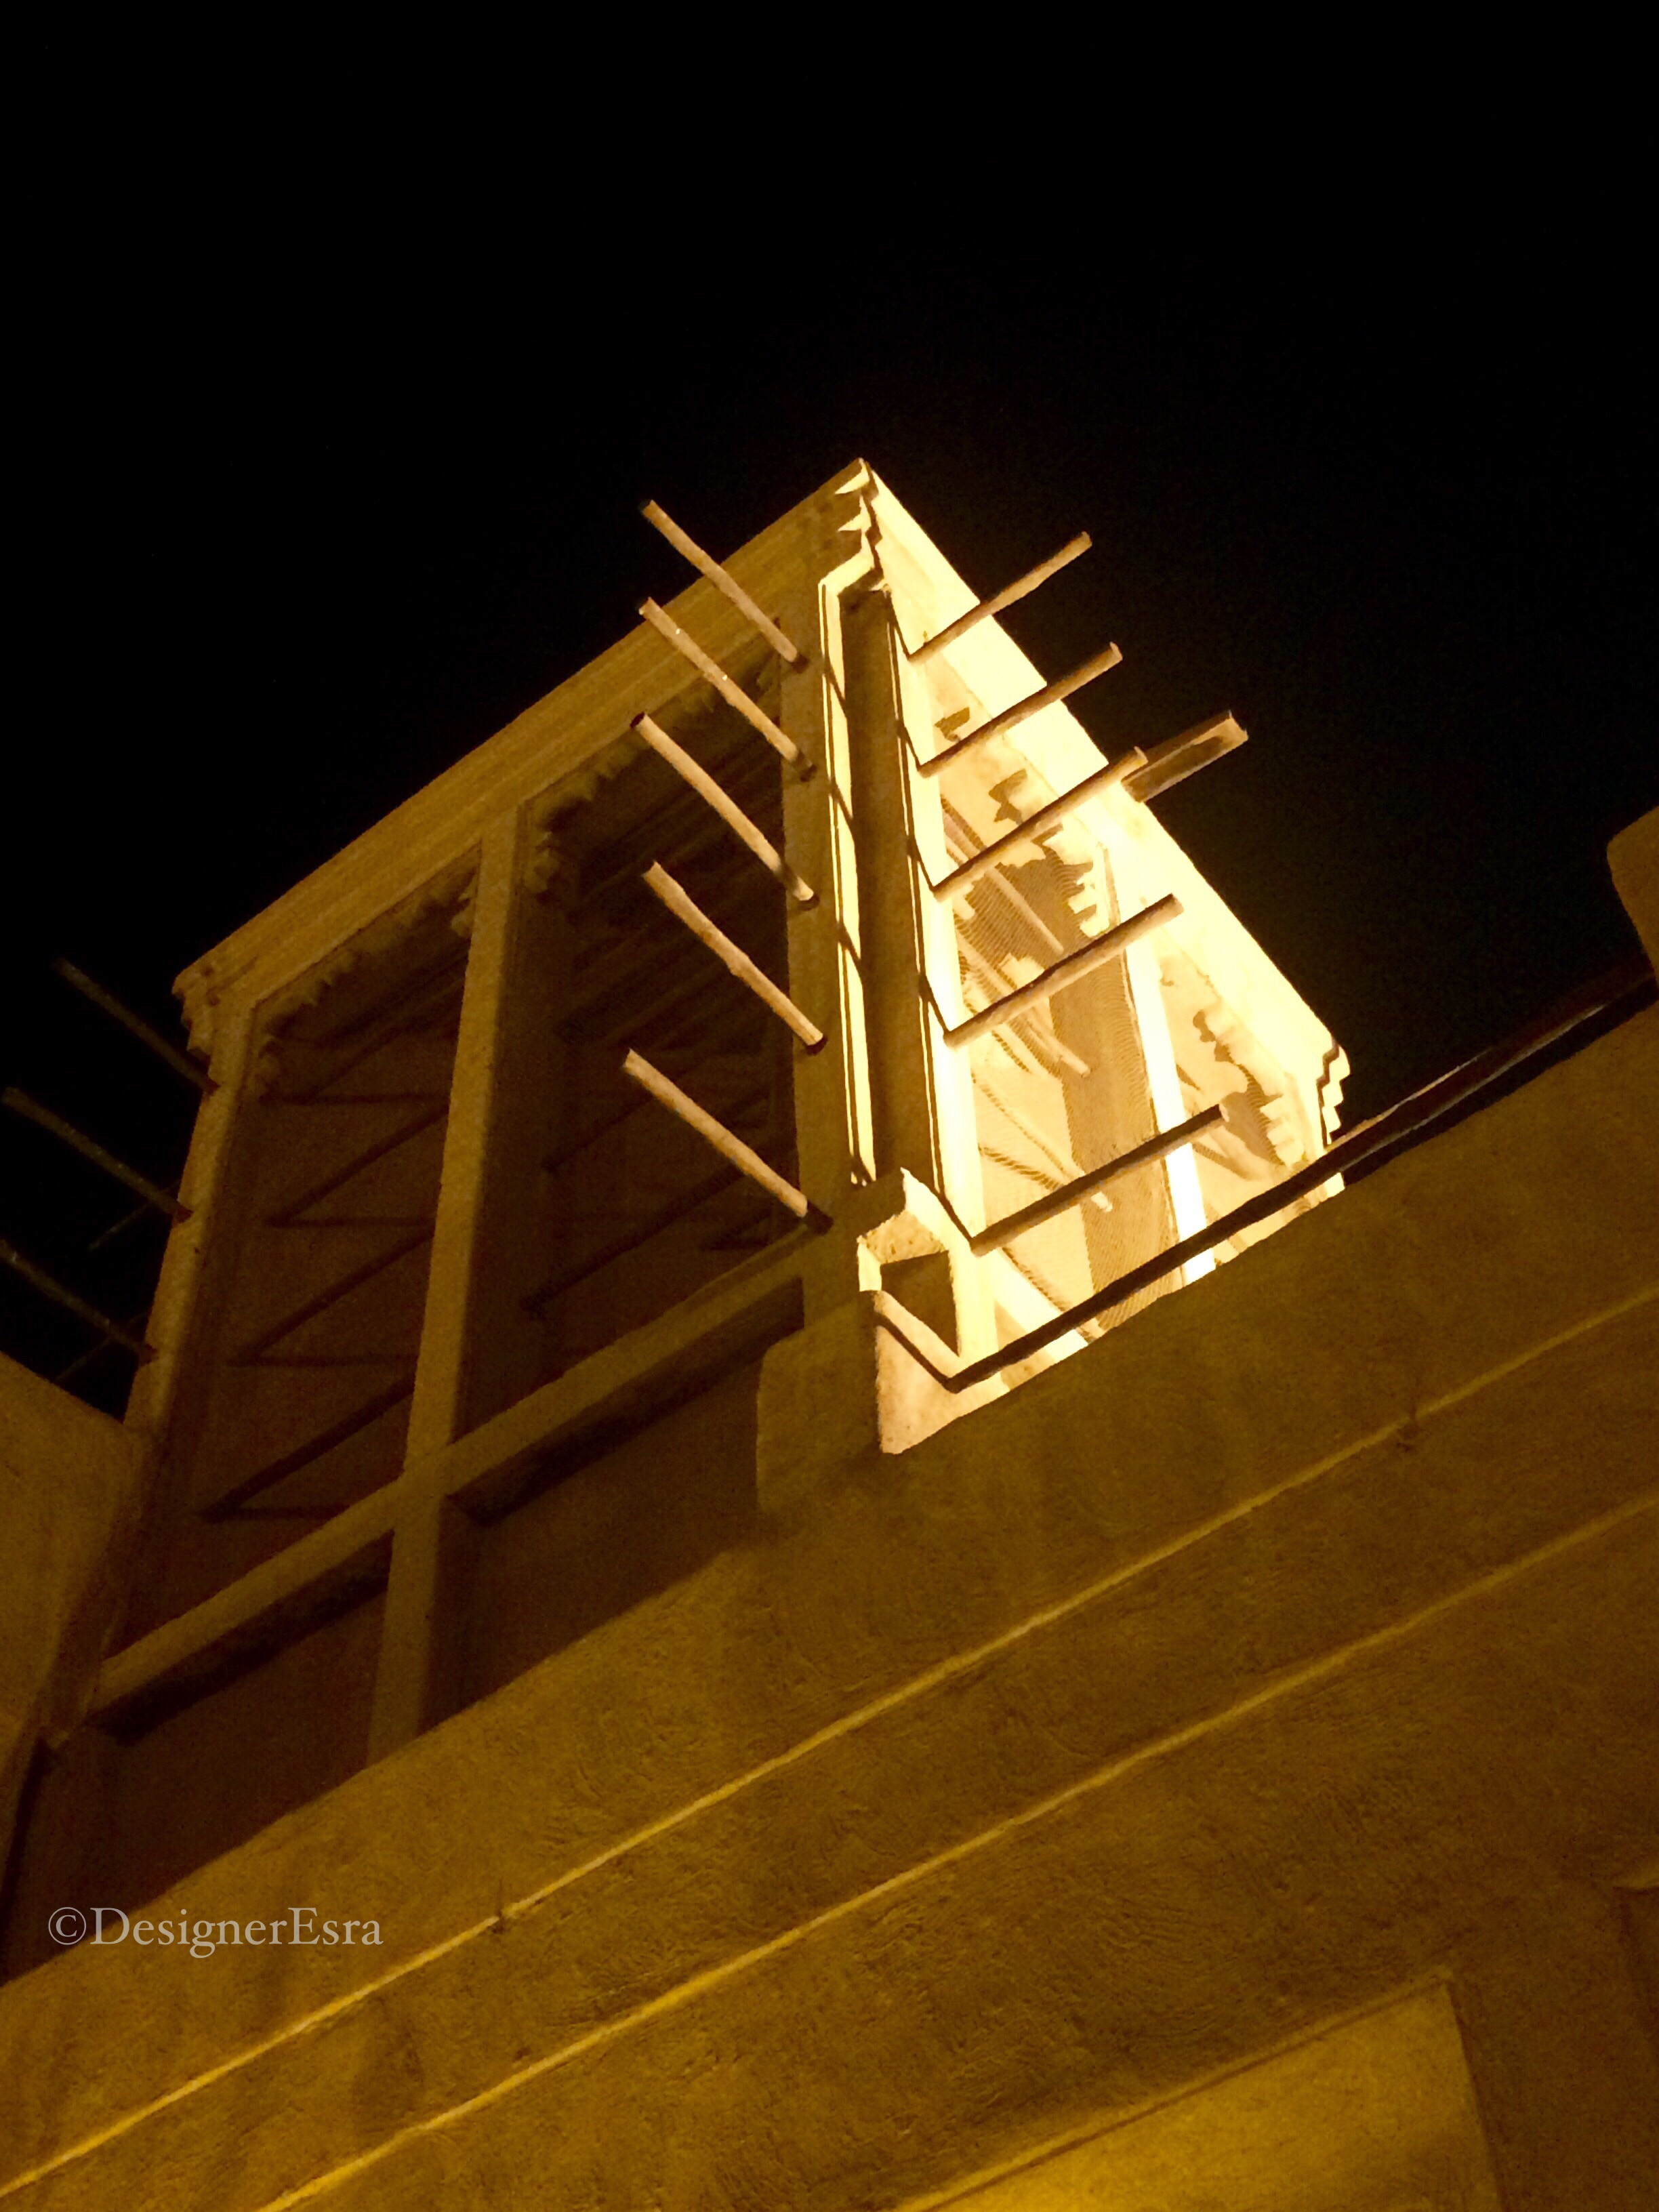 Sheikh Saeed Al Maktoum House in Dubai